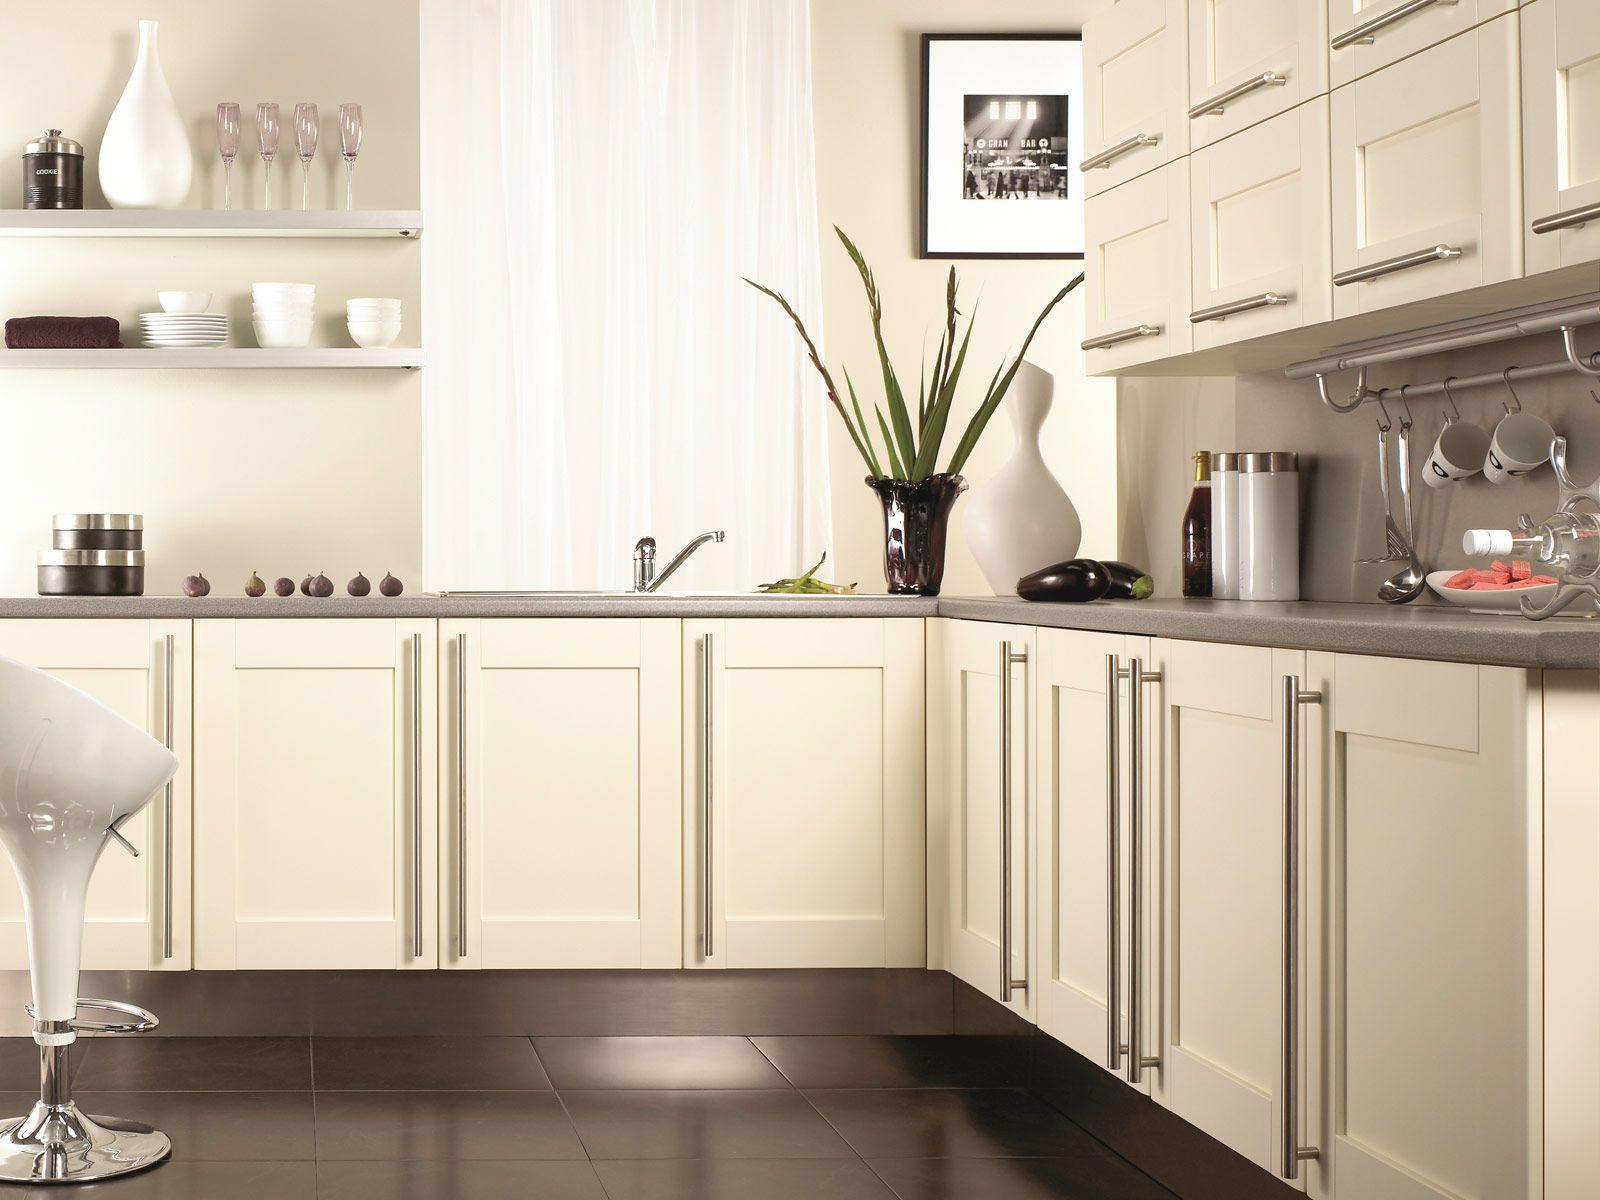 Ikea_Nz Ikea Kitchen From Nordicdesignconz Online Store Fair Kitchen Cabinet Design Ikea Review